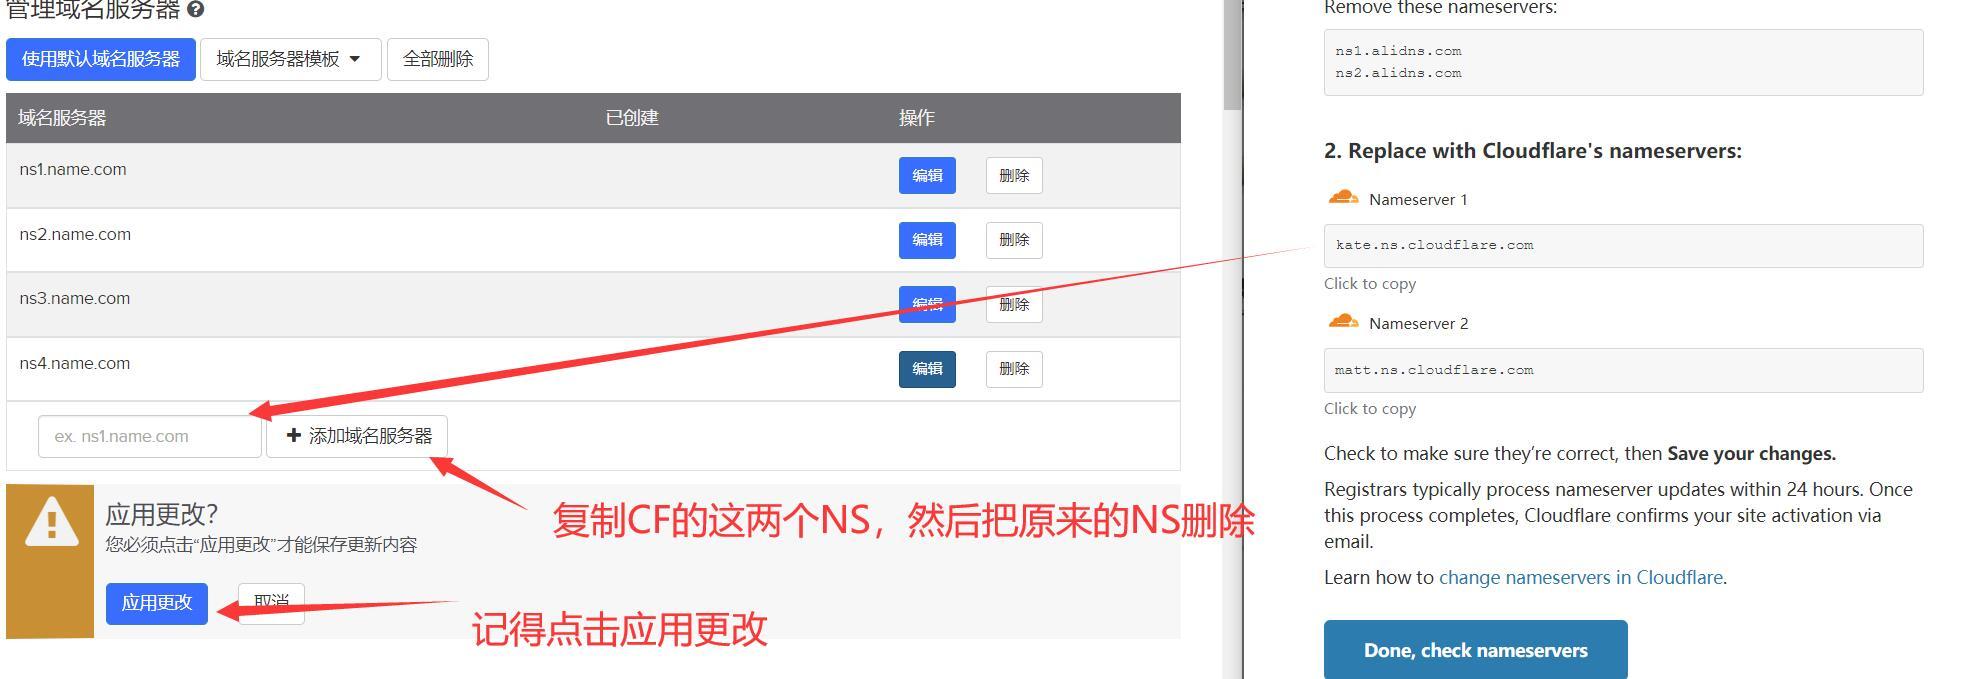 wordpress搭建和初步优化:使用 cloudflare 进行 CDN 解析  第8张